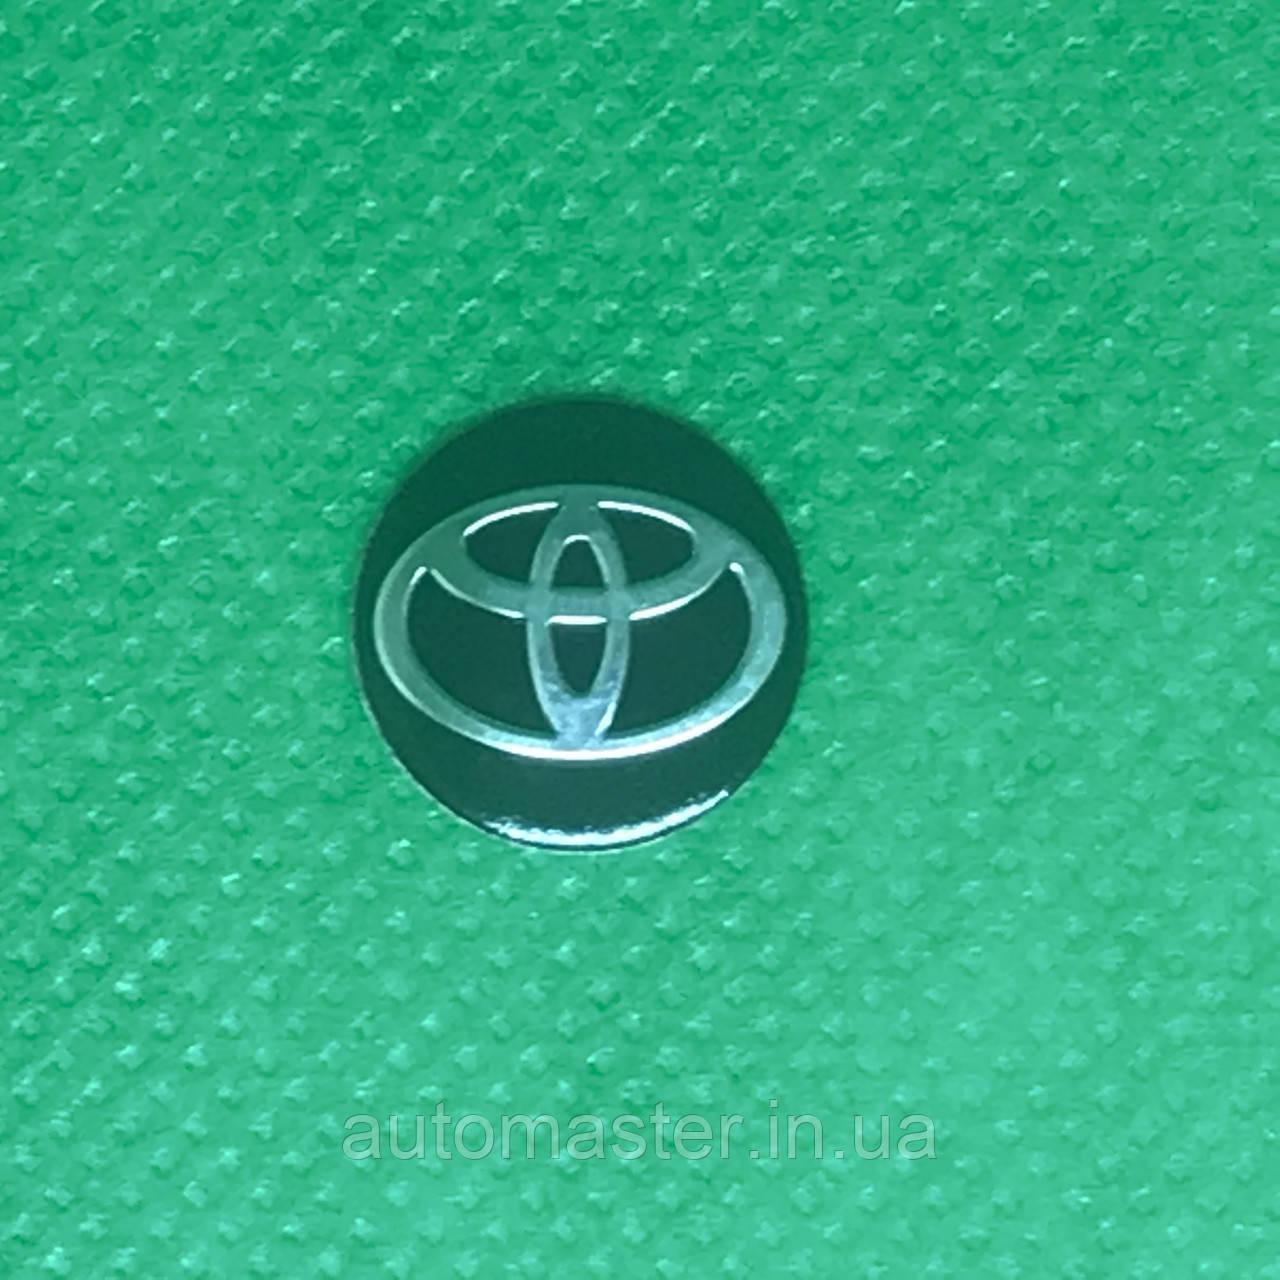 Логотип для авто ключа Toyota Тойота